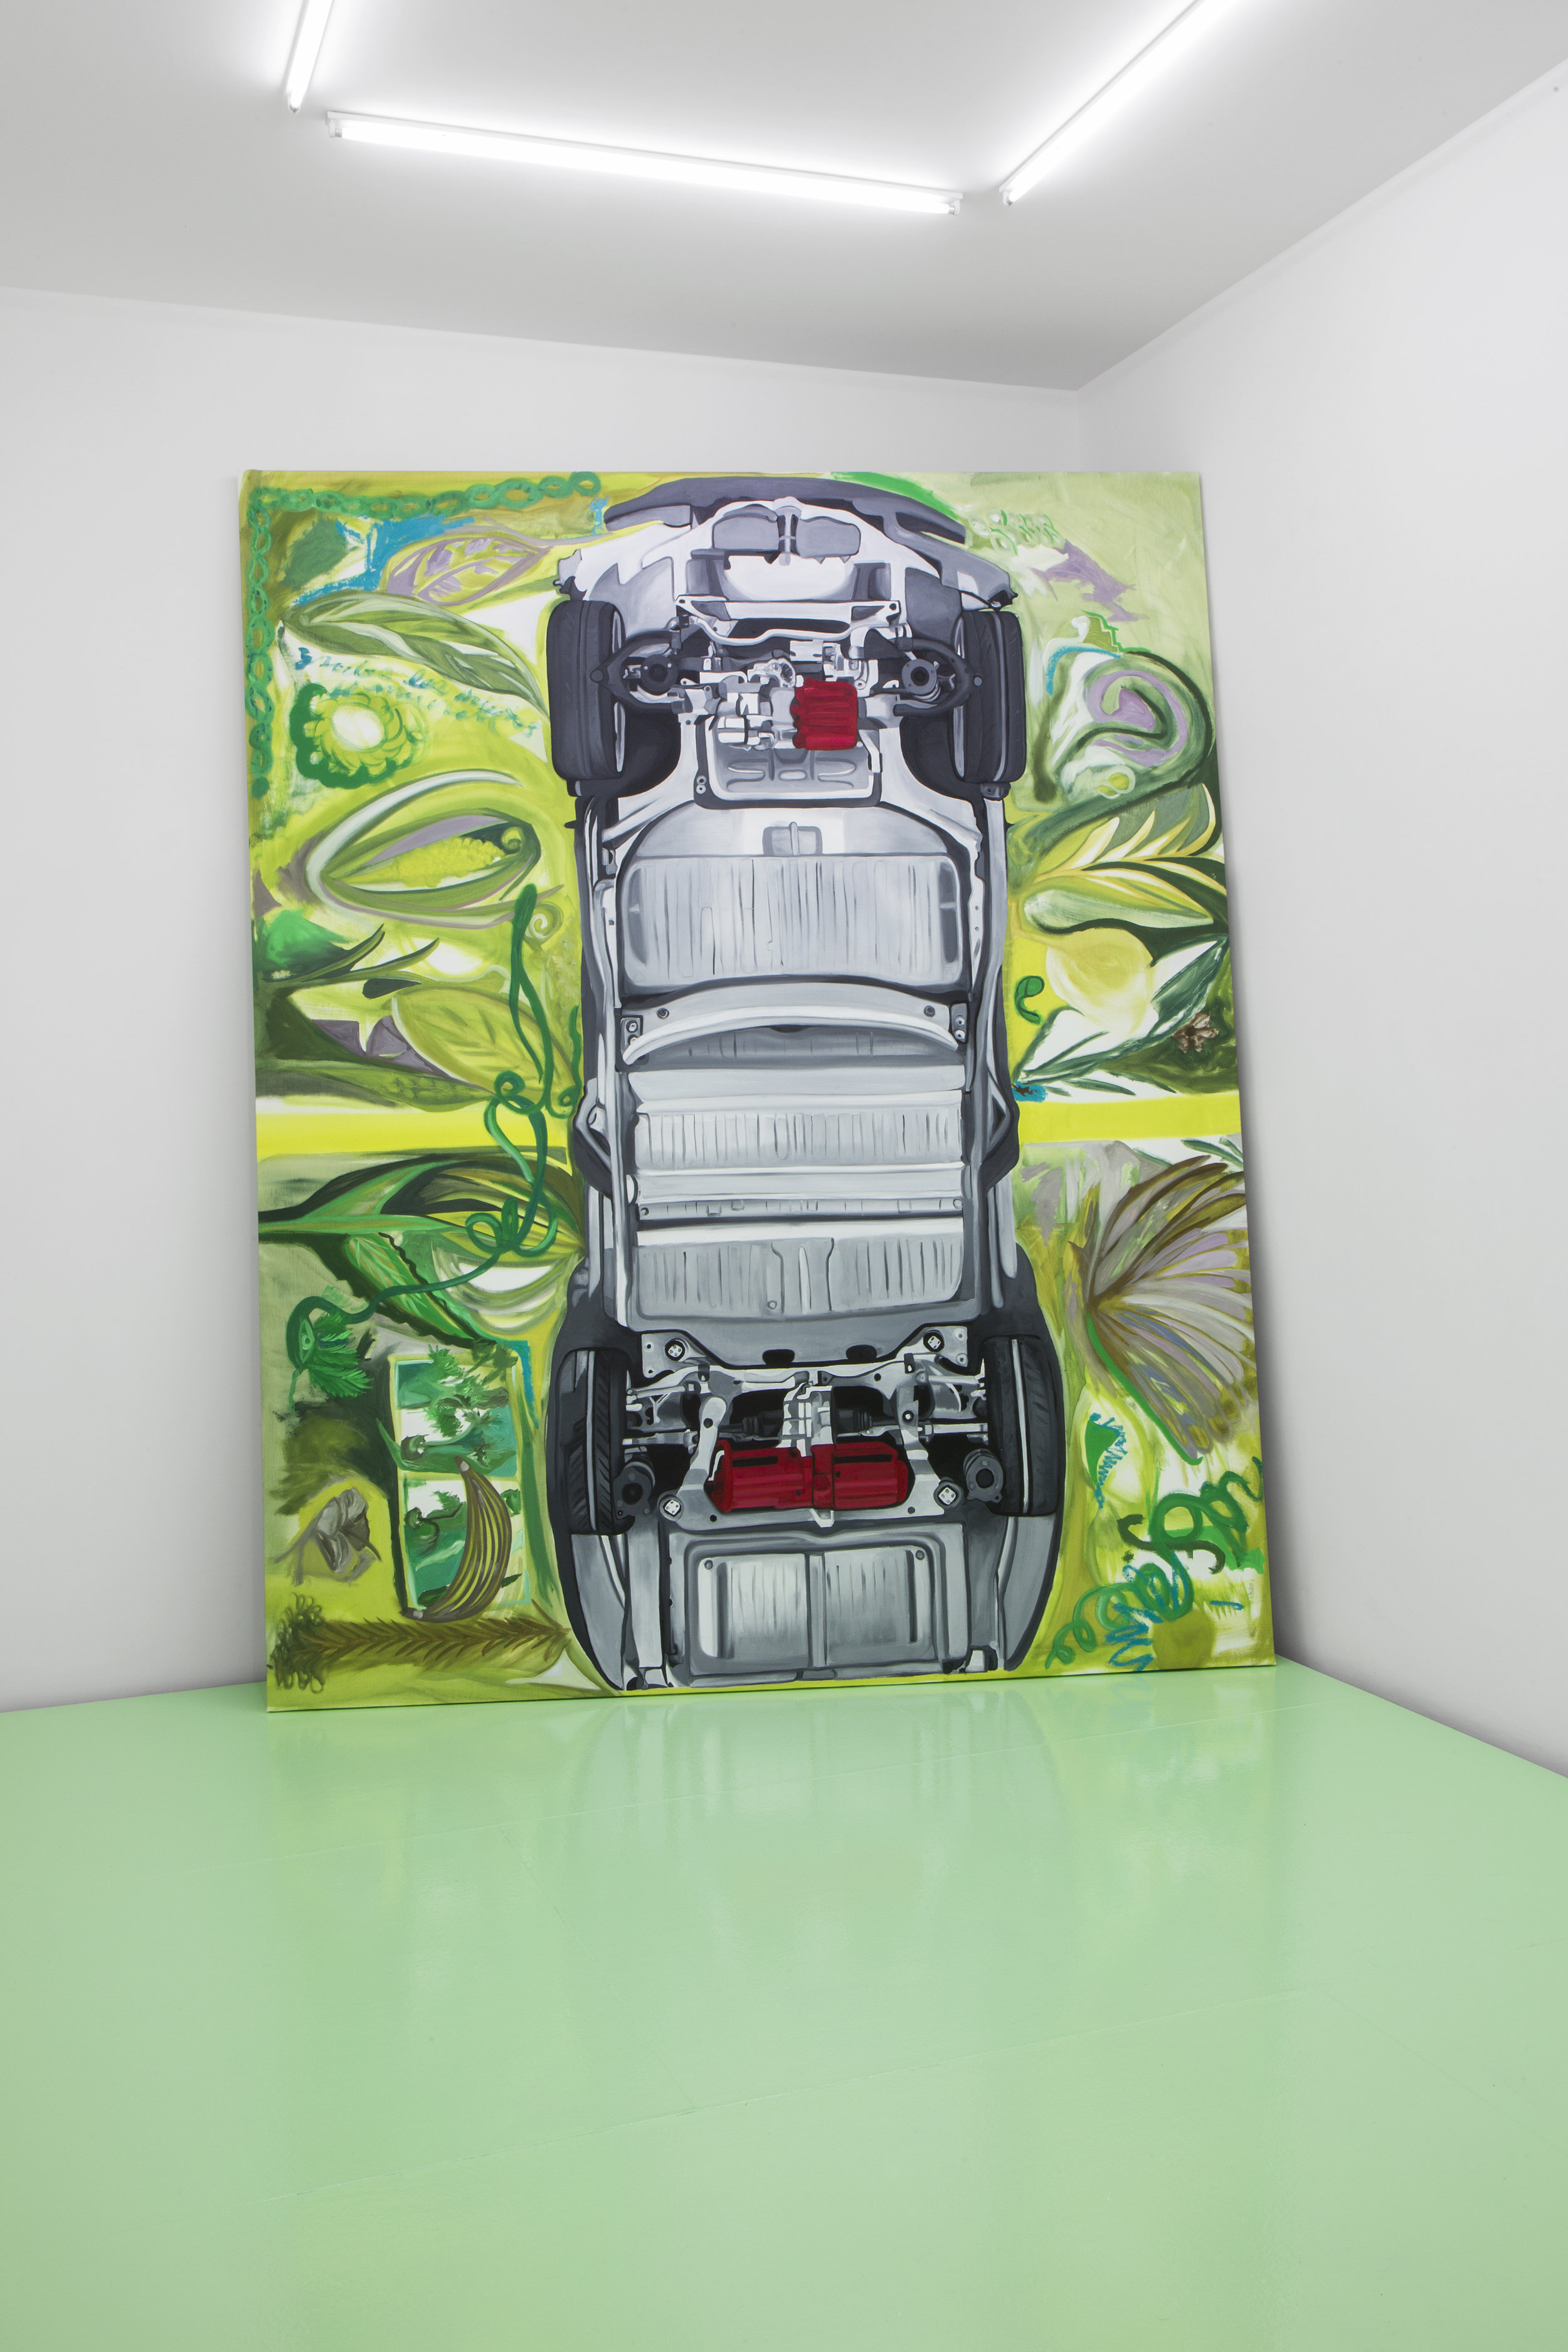 Frieda Toranzo Jaeger,  Tesla , 2018. Oil on canvas, 205 x 255 cm; 80.7 x 100.39 inches.